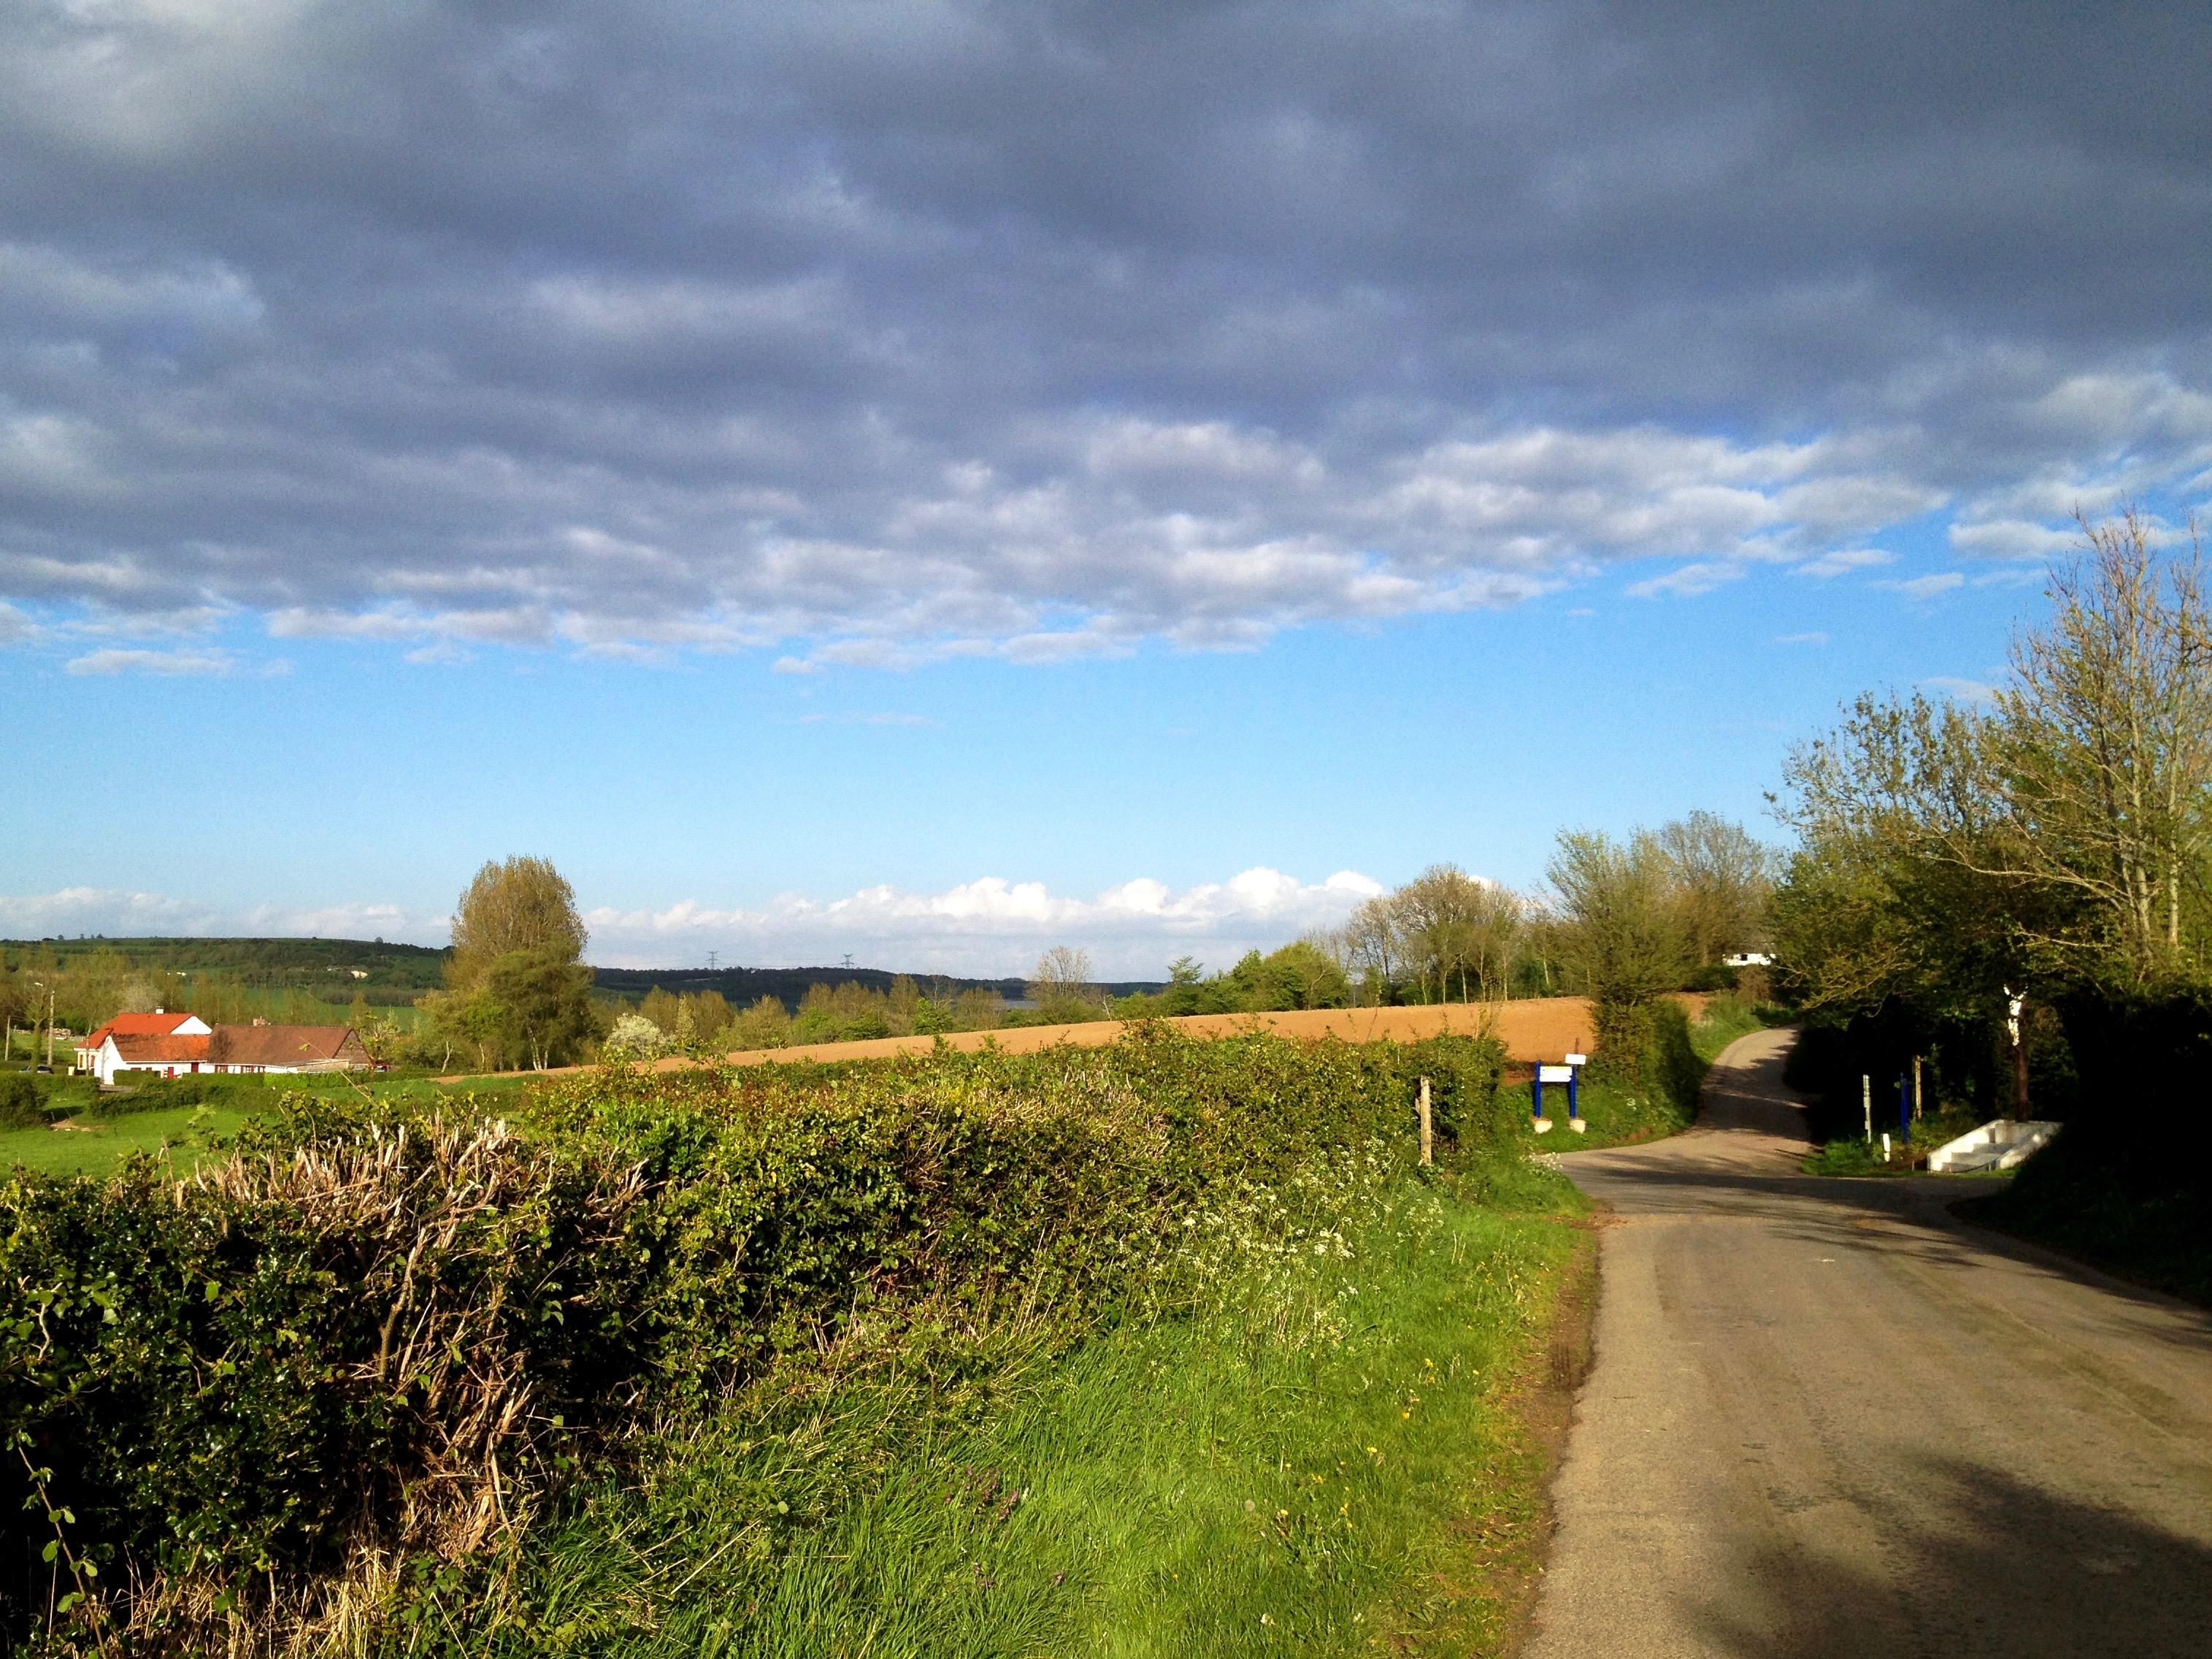 The road to Brunembert, Pas-de-Calais, France